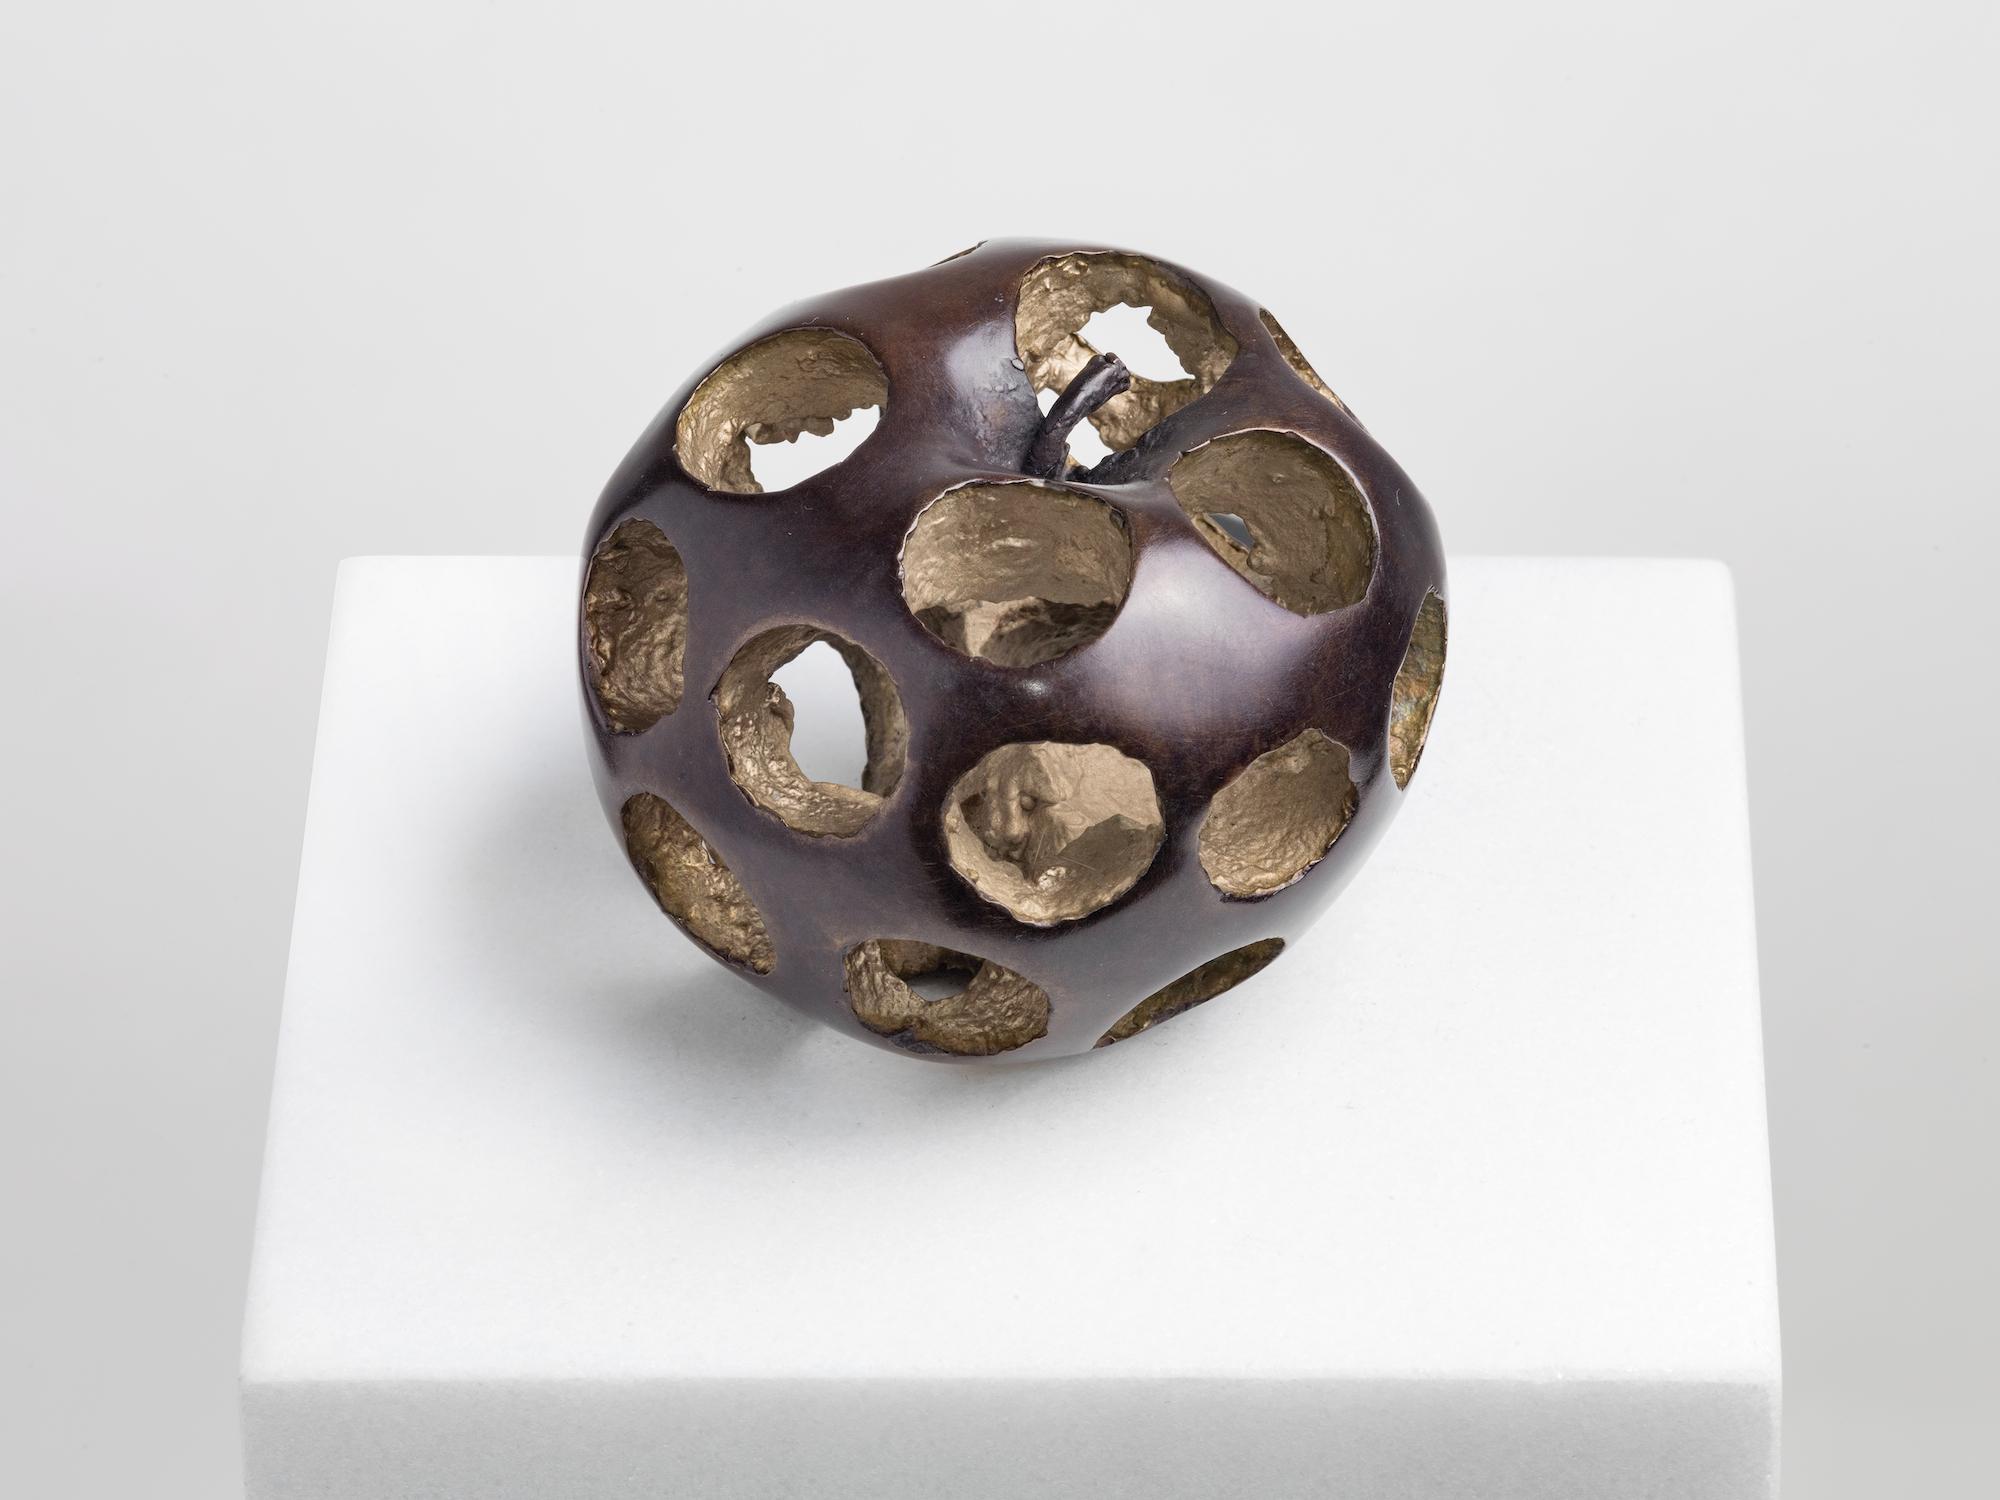 Alicja Kwade Malus Fularum, 2019 Bronze, 6 x 7,5 x  7,5 cm 5.450 € (with marble pedestal 5.950 €)  Edition 11/12 + 3 AP